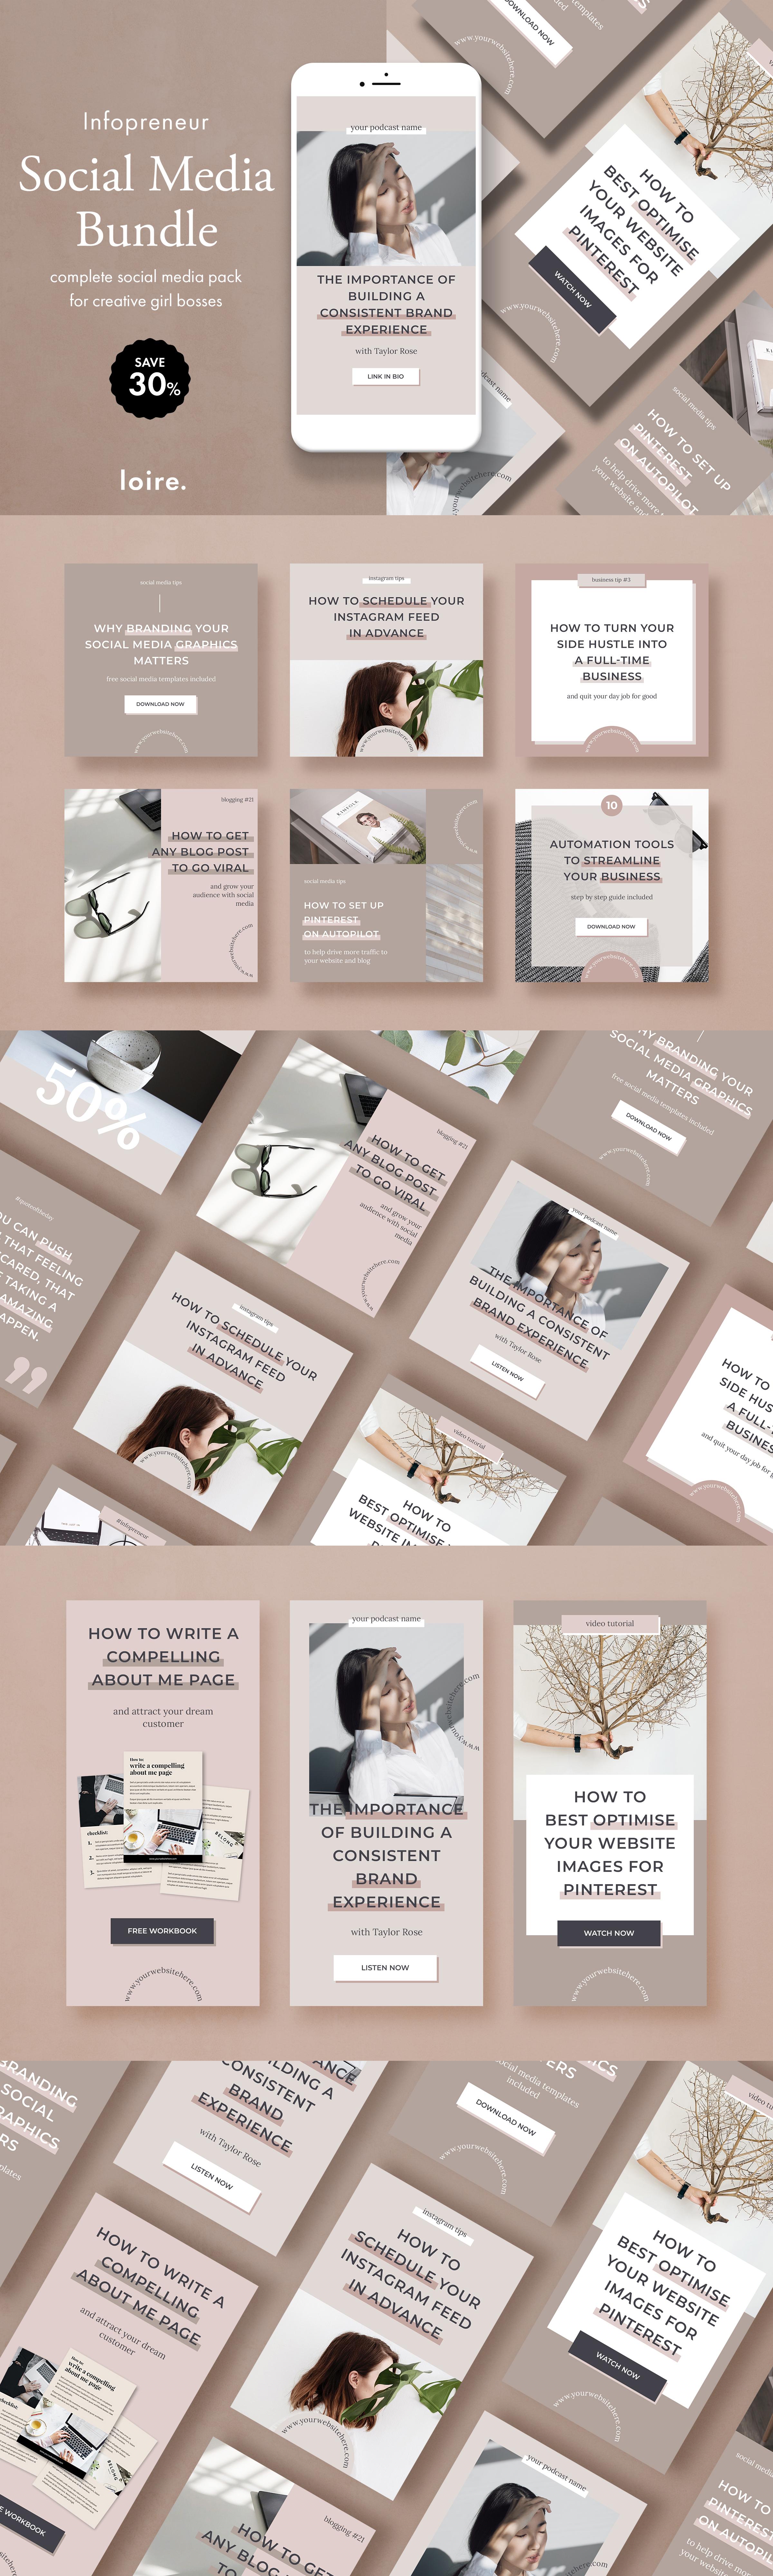 Infopreneur social media marketing bundle for bloggers example image 20